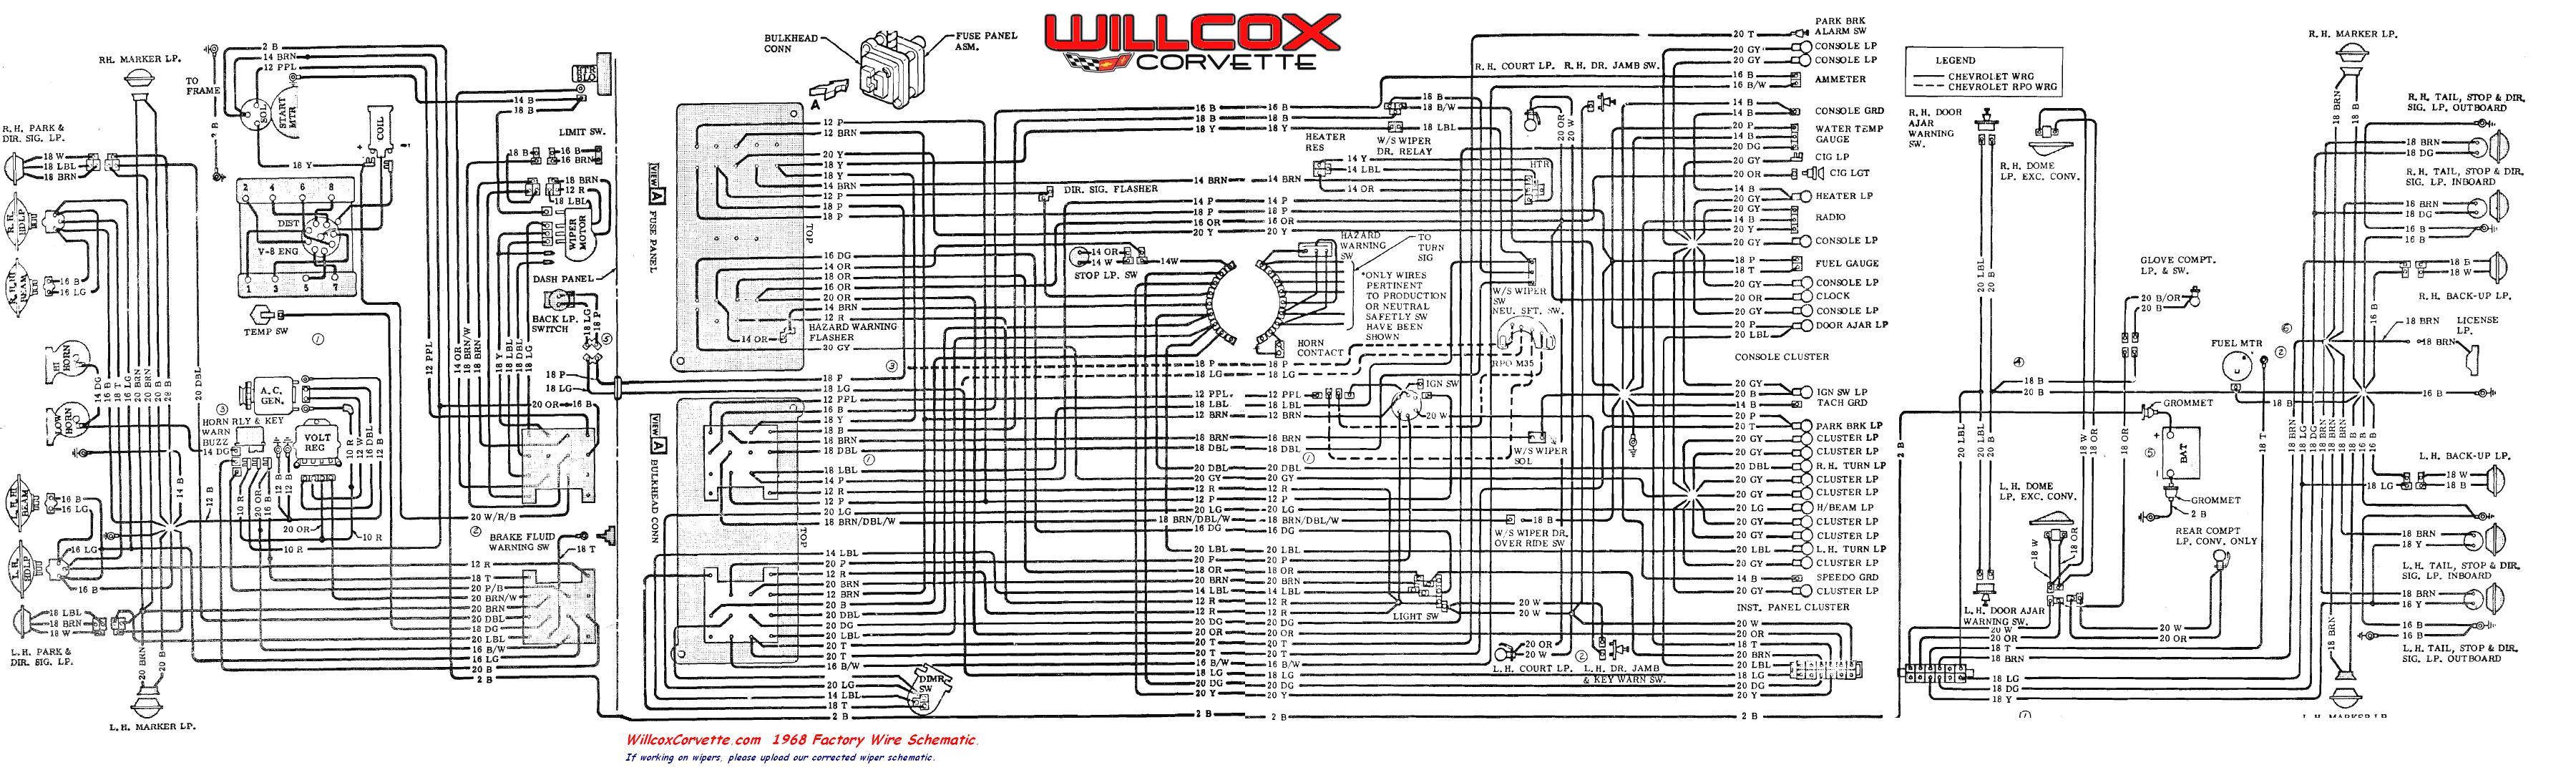 2005 Baja 90cc Atv Wiring Diagram | Wiring Diagram Baja Cc Atv Wiring Diagram Diagrams Wd Bajawd on